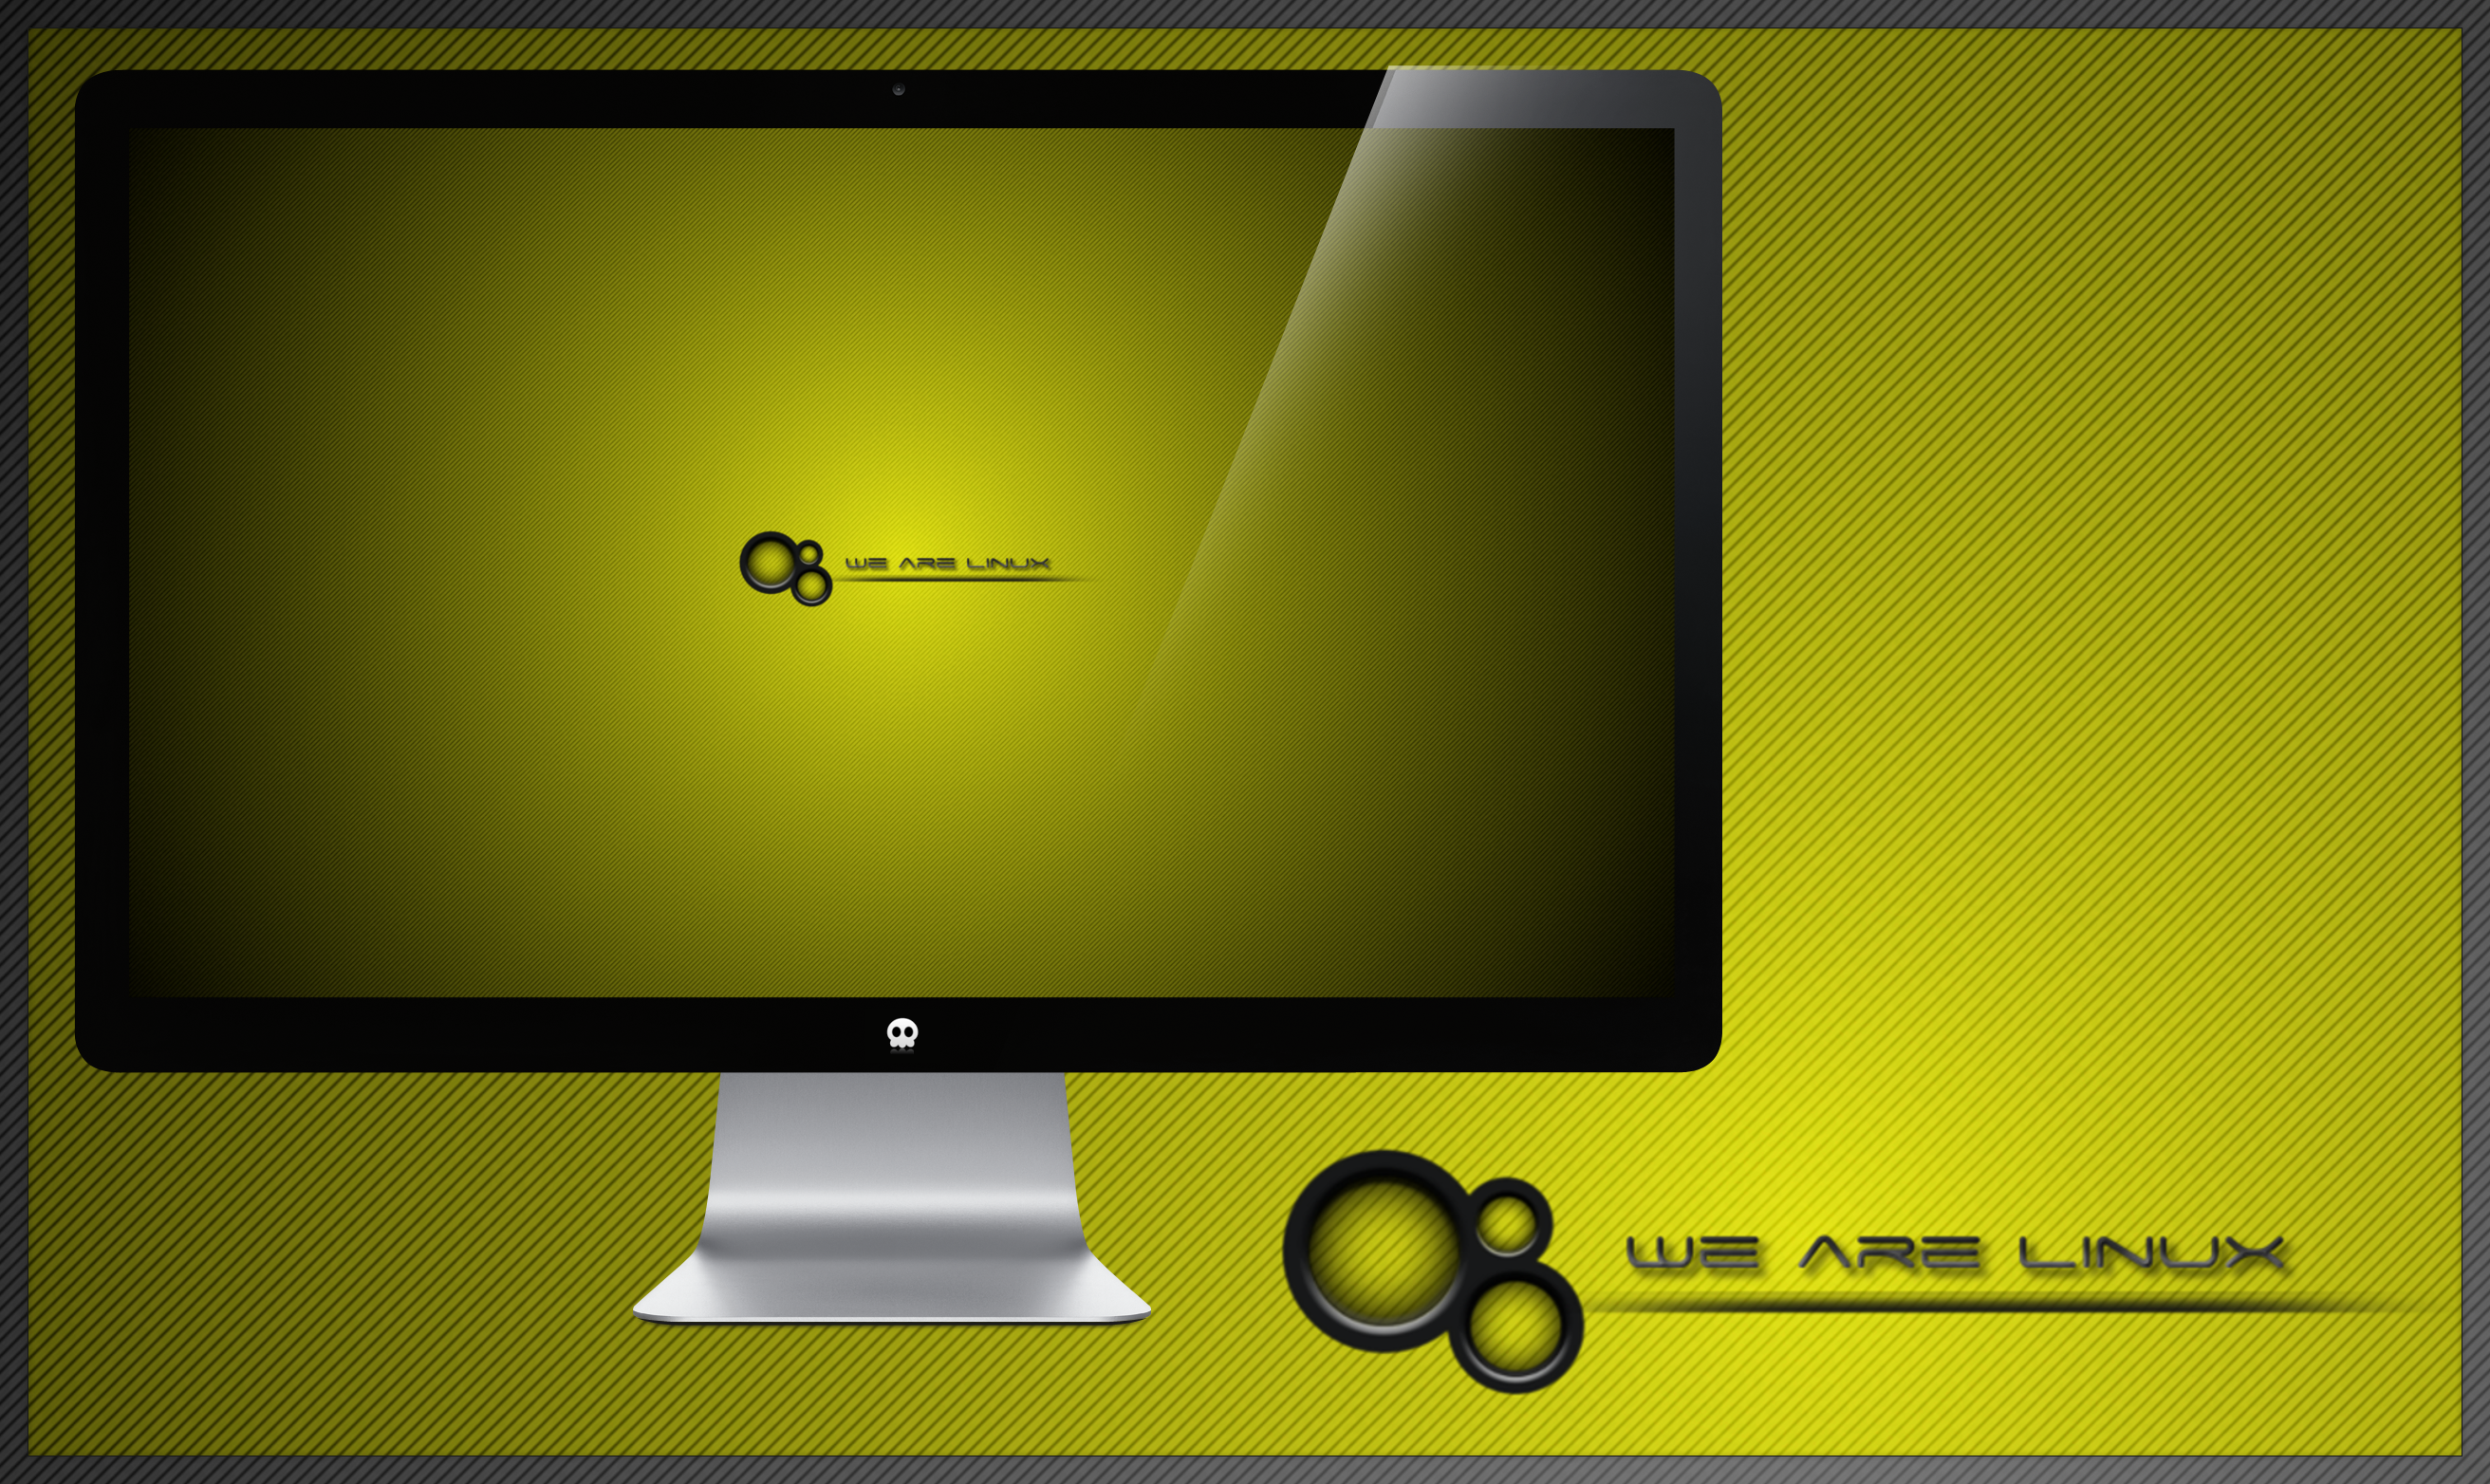 We are Linux by miguelsanchez666